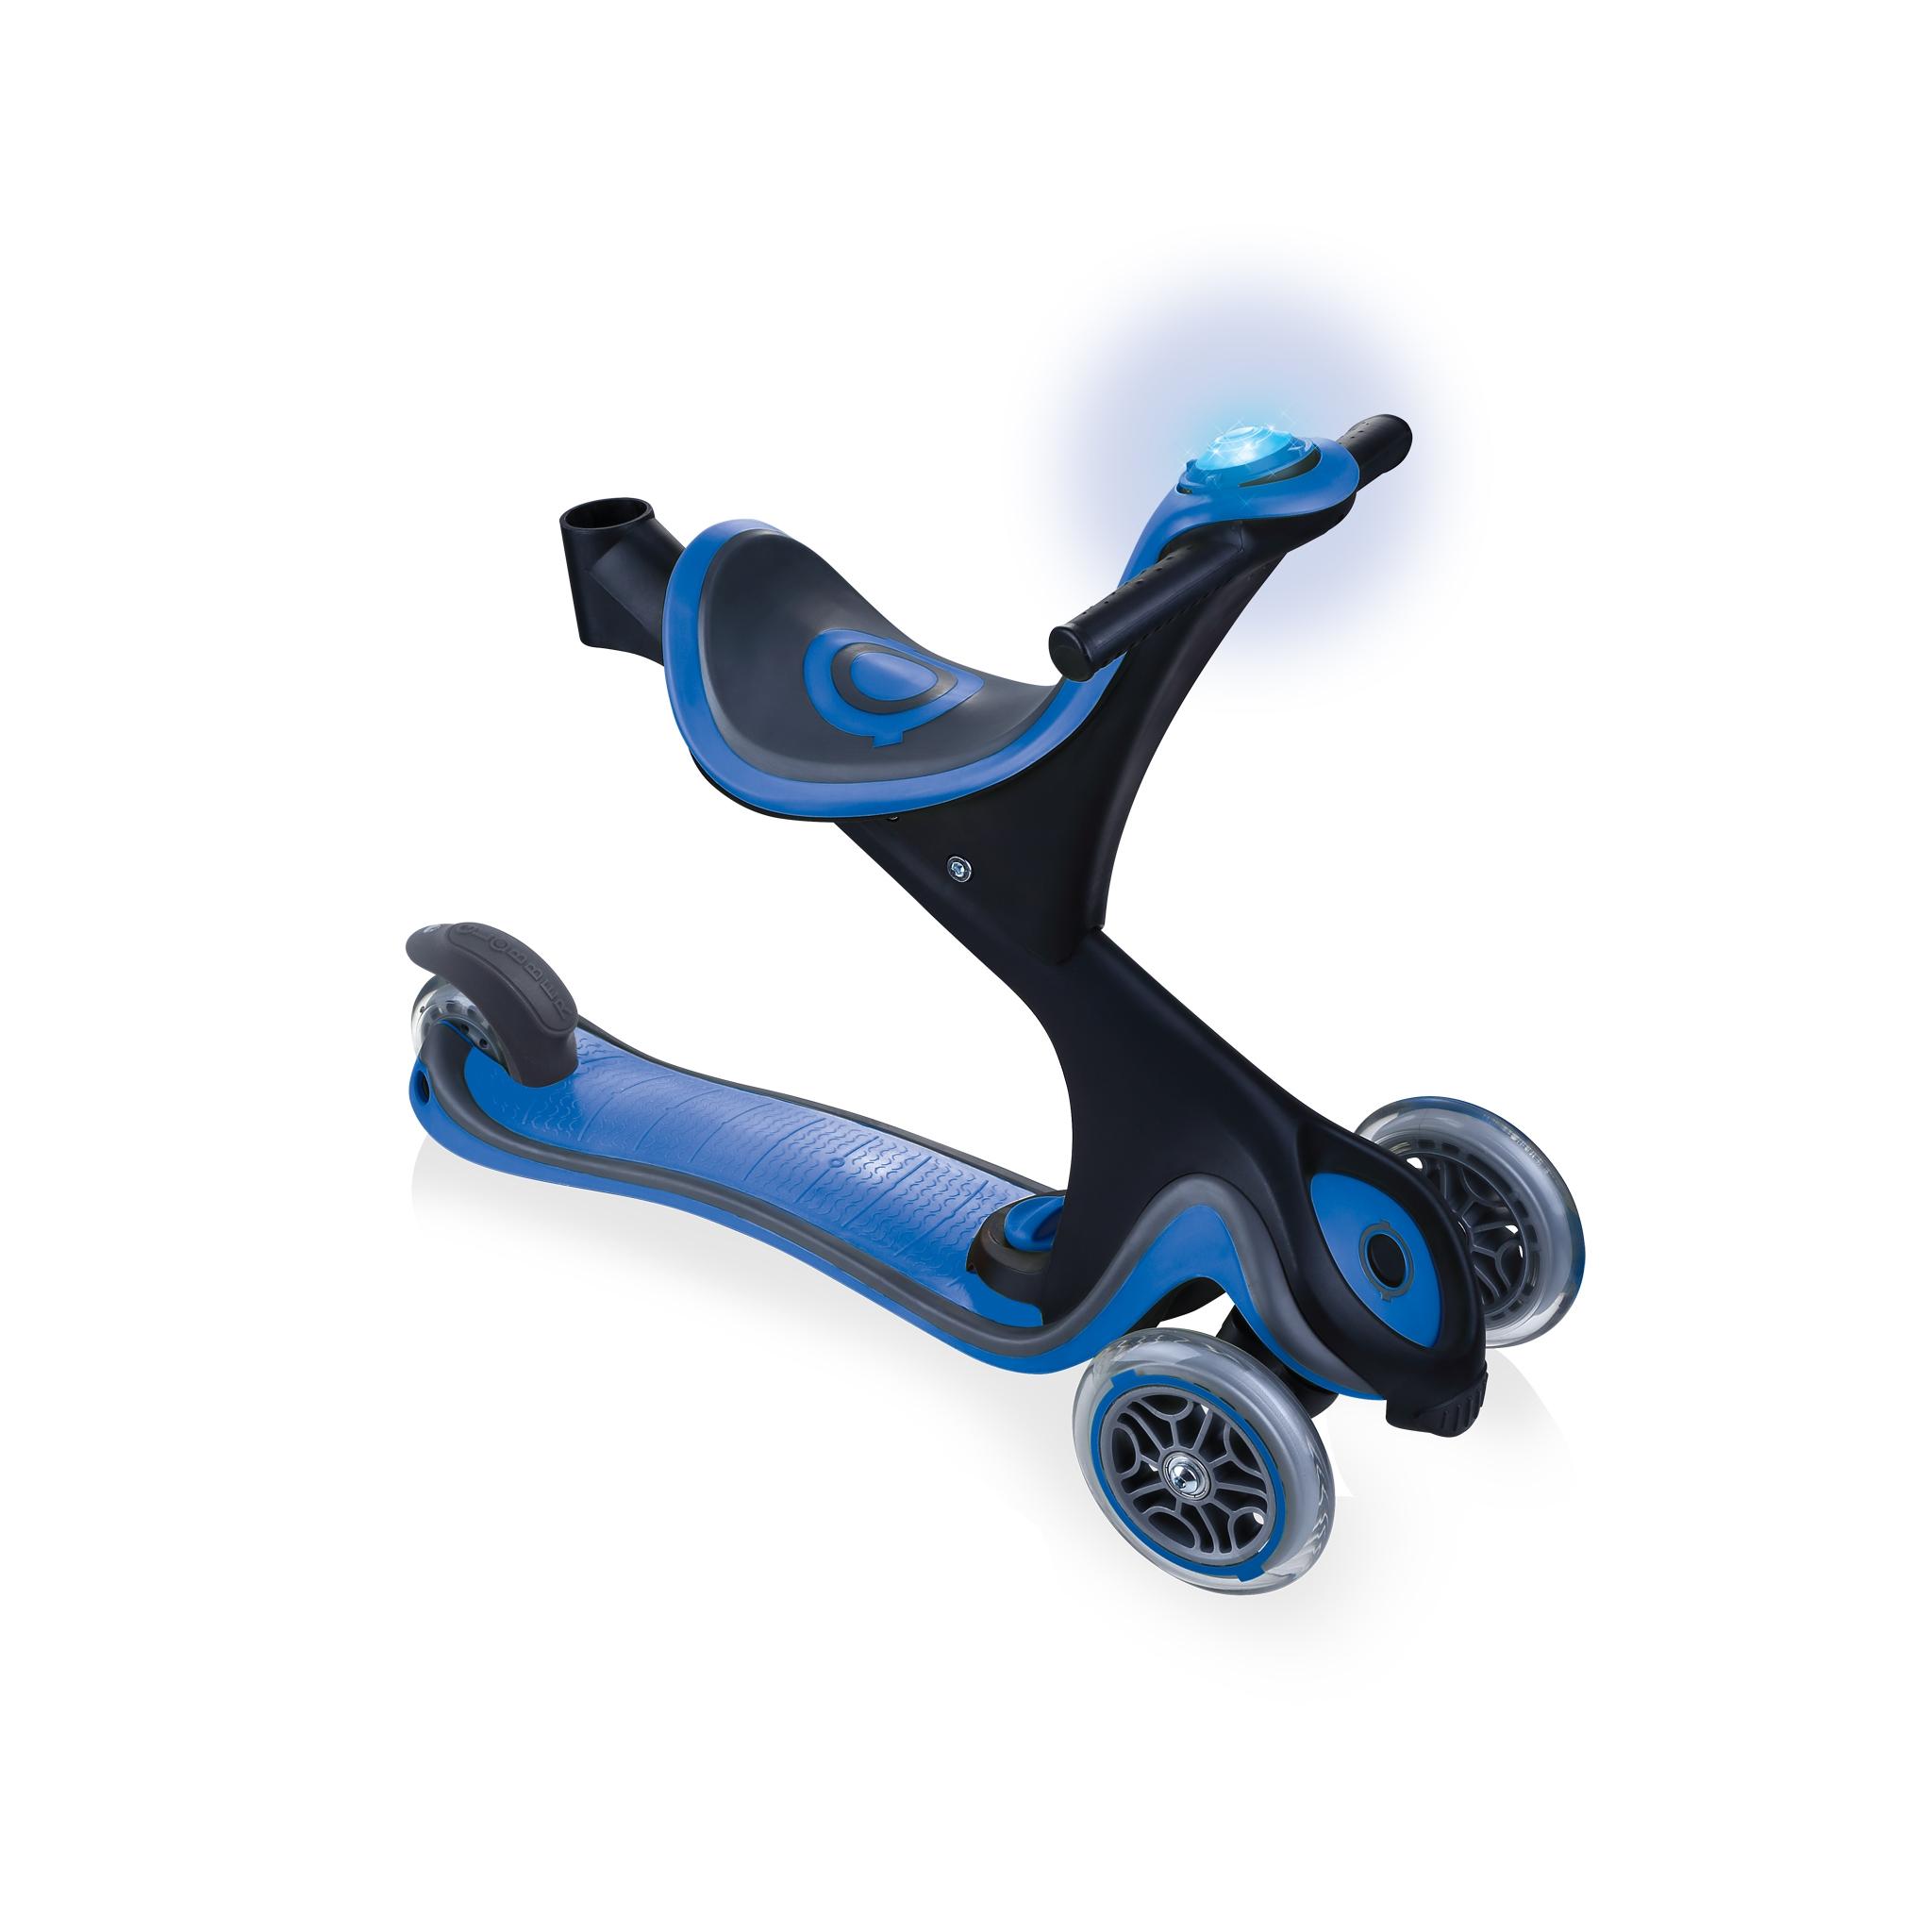 GO-UP-COMFORT-PLAY-walking-bike-mode_navy-blue 2